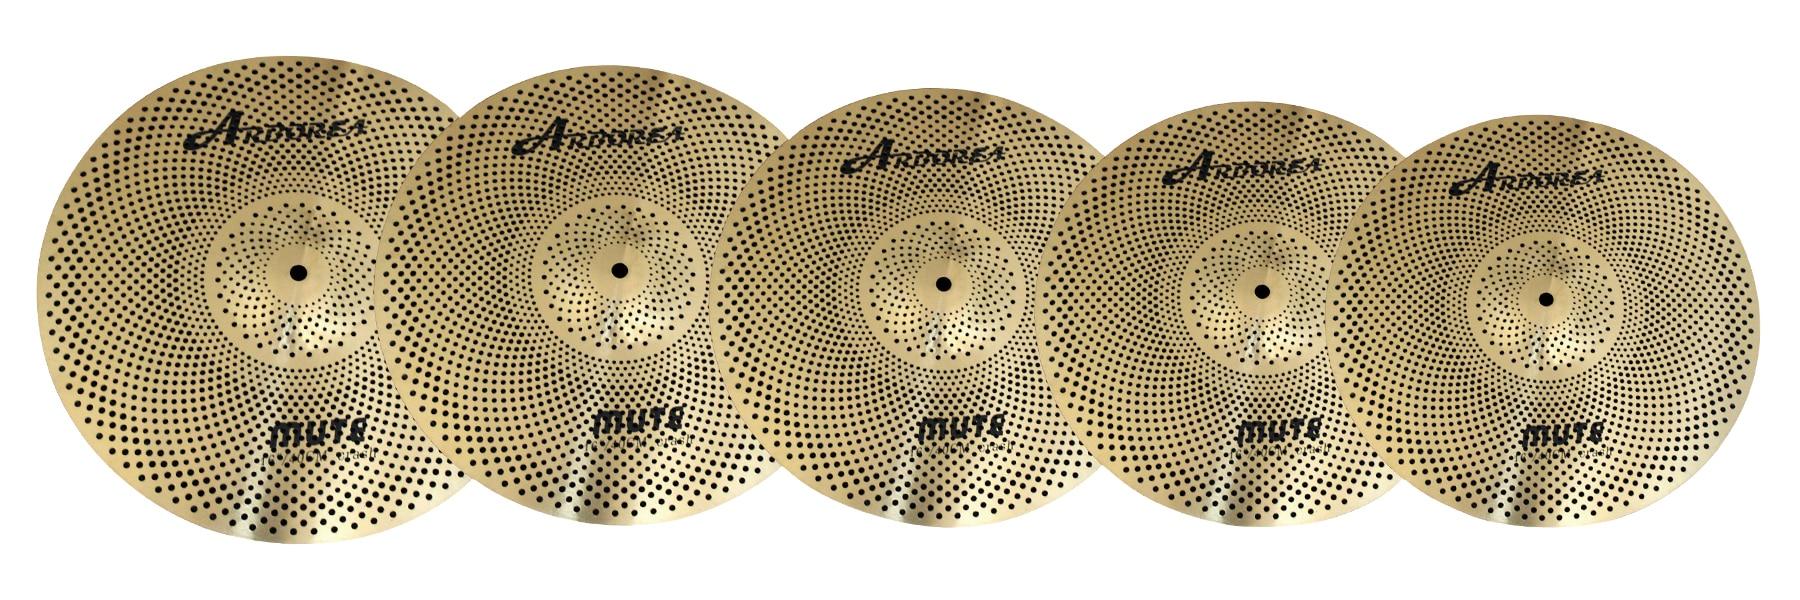 Arborea Glod-plating Mute Cymbal Pack 14''HH + 16'' Crash + 18'' Crash +20'' Ride+Cymbals Bag